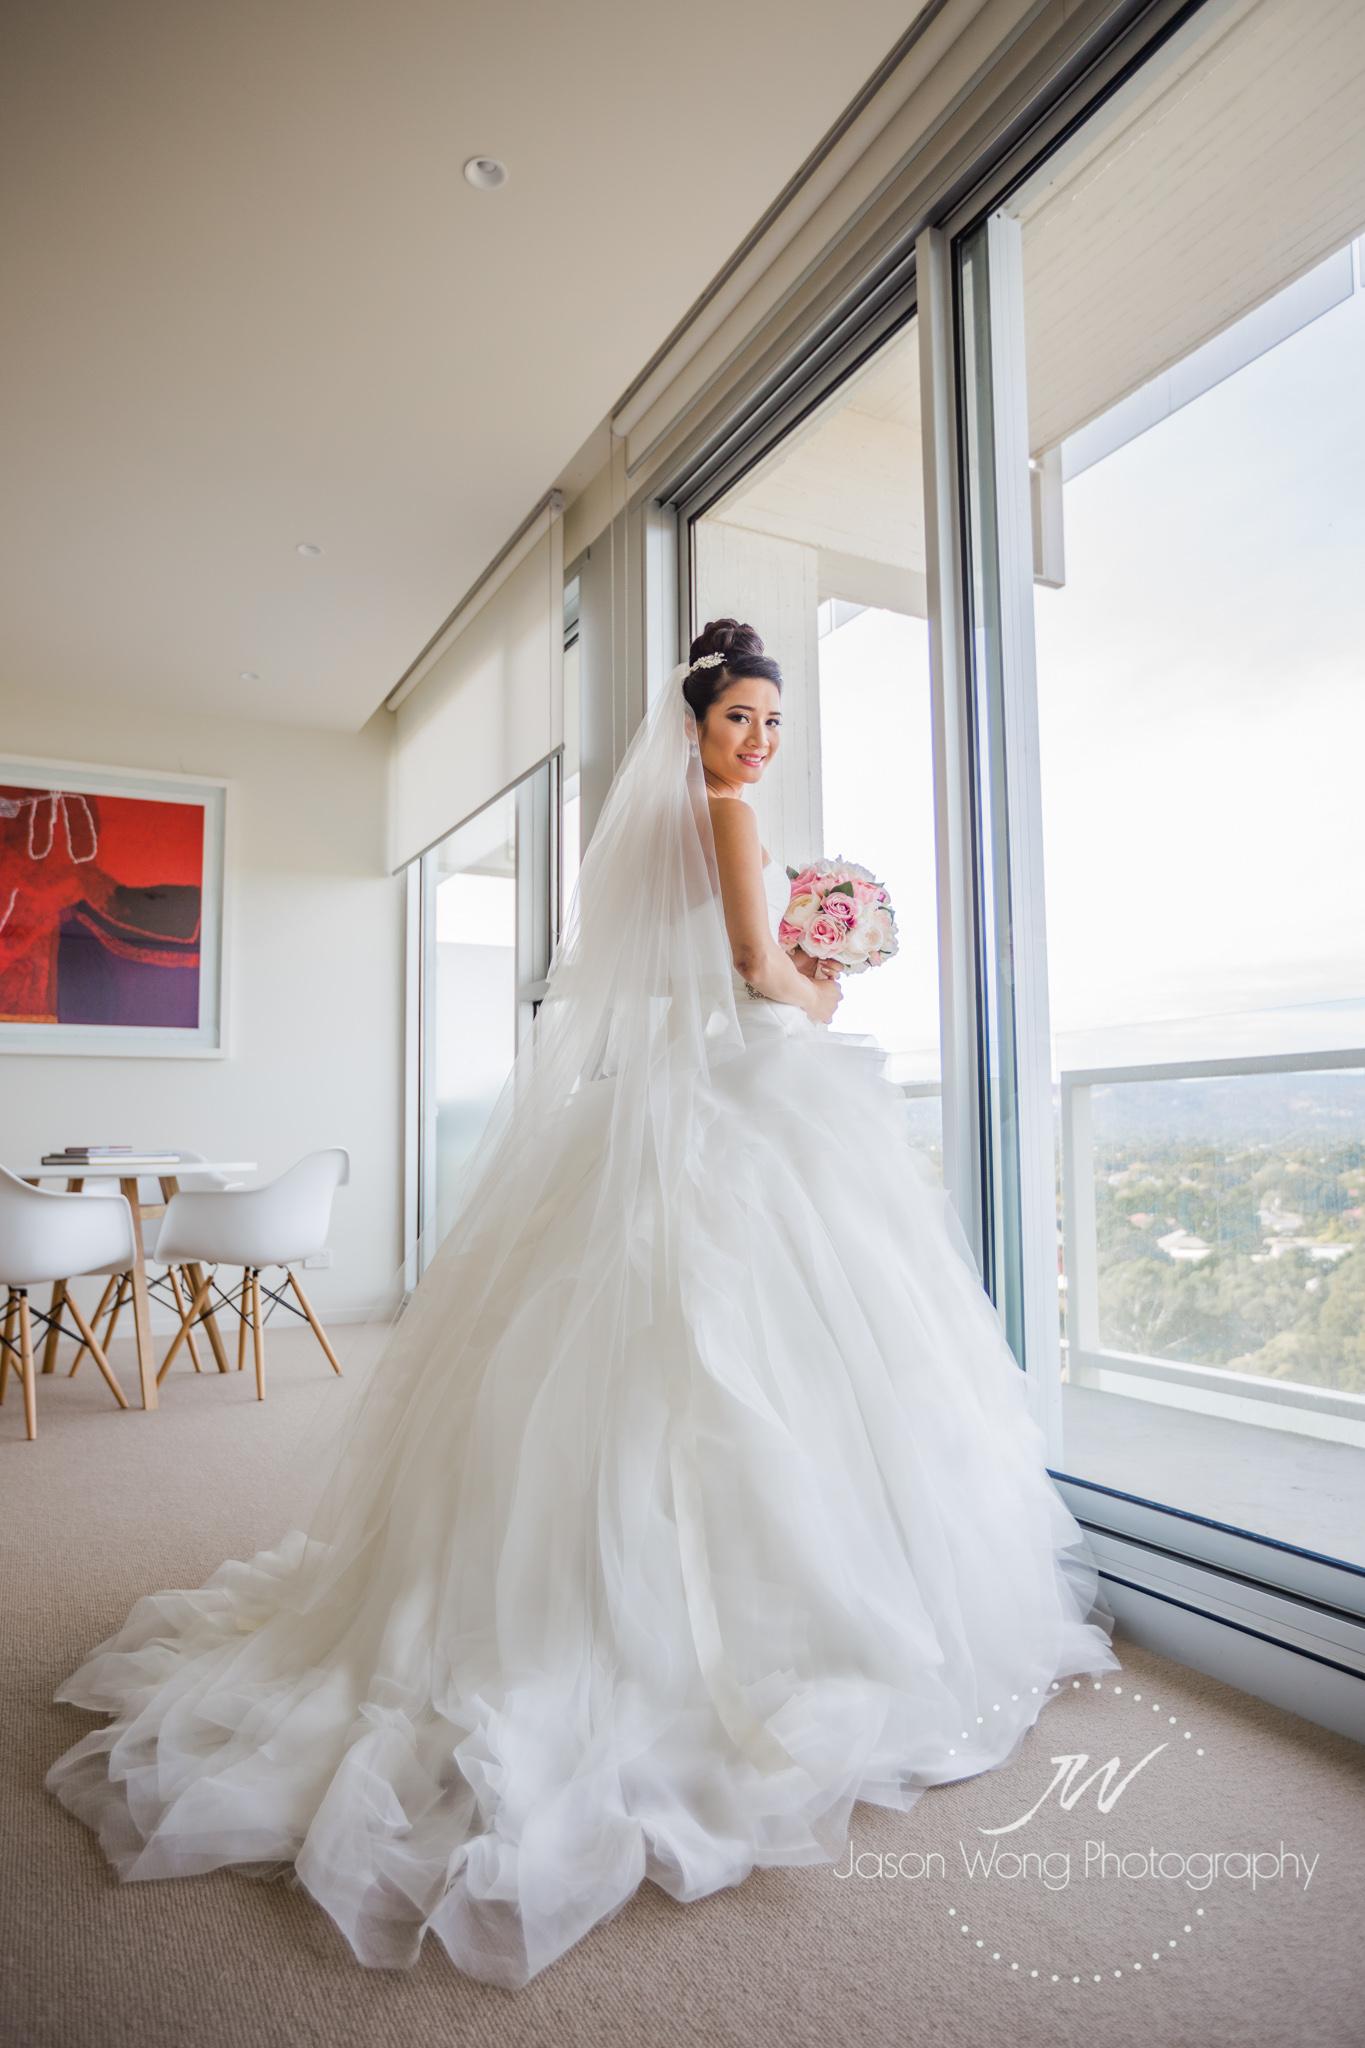 bride-dressing-wedding-dress.jpg